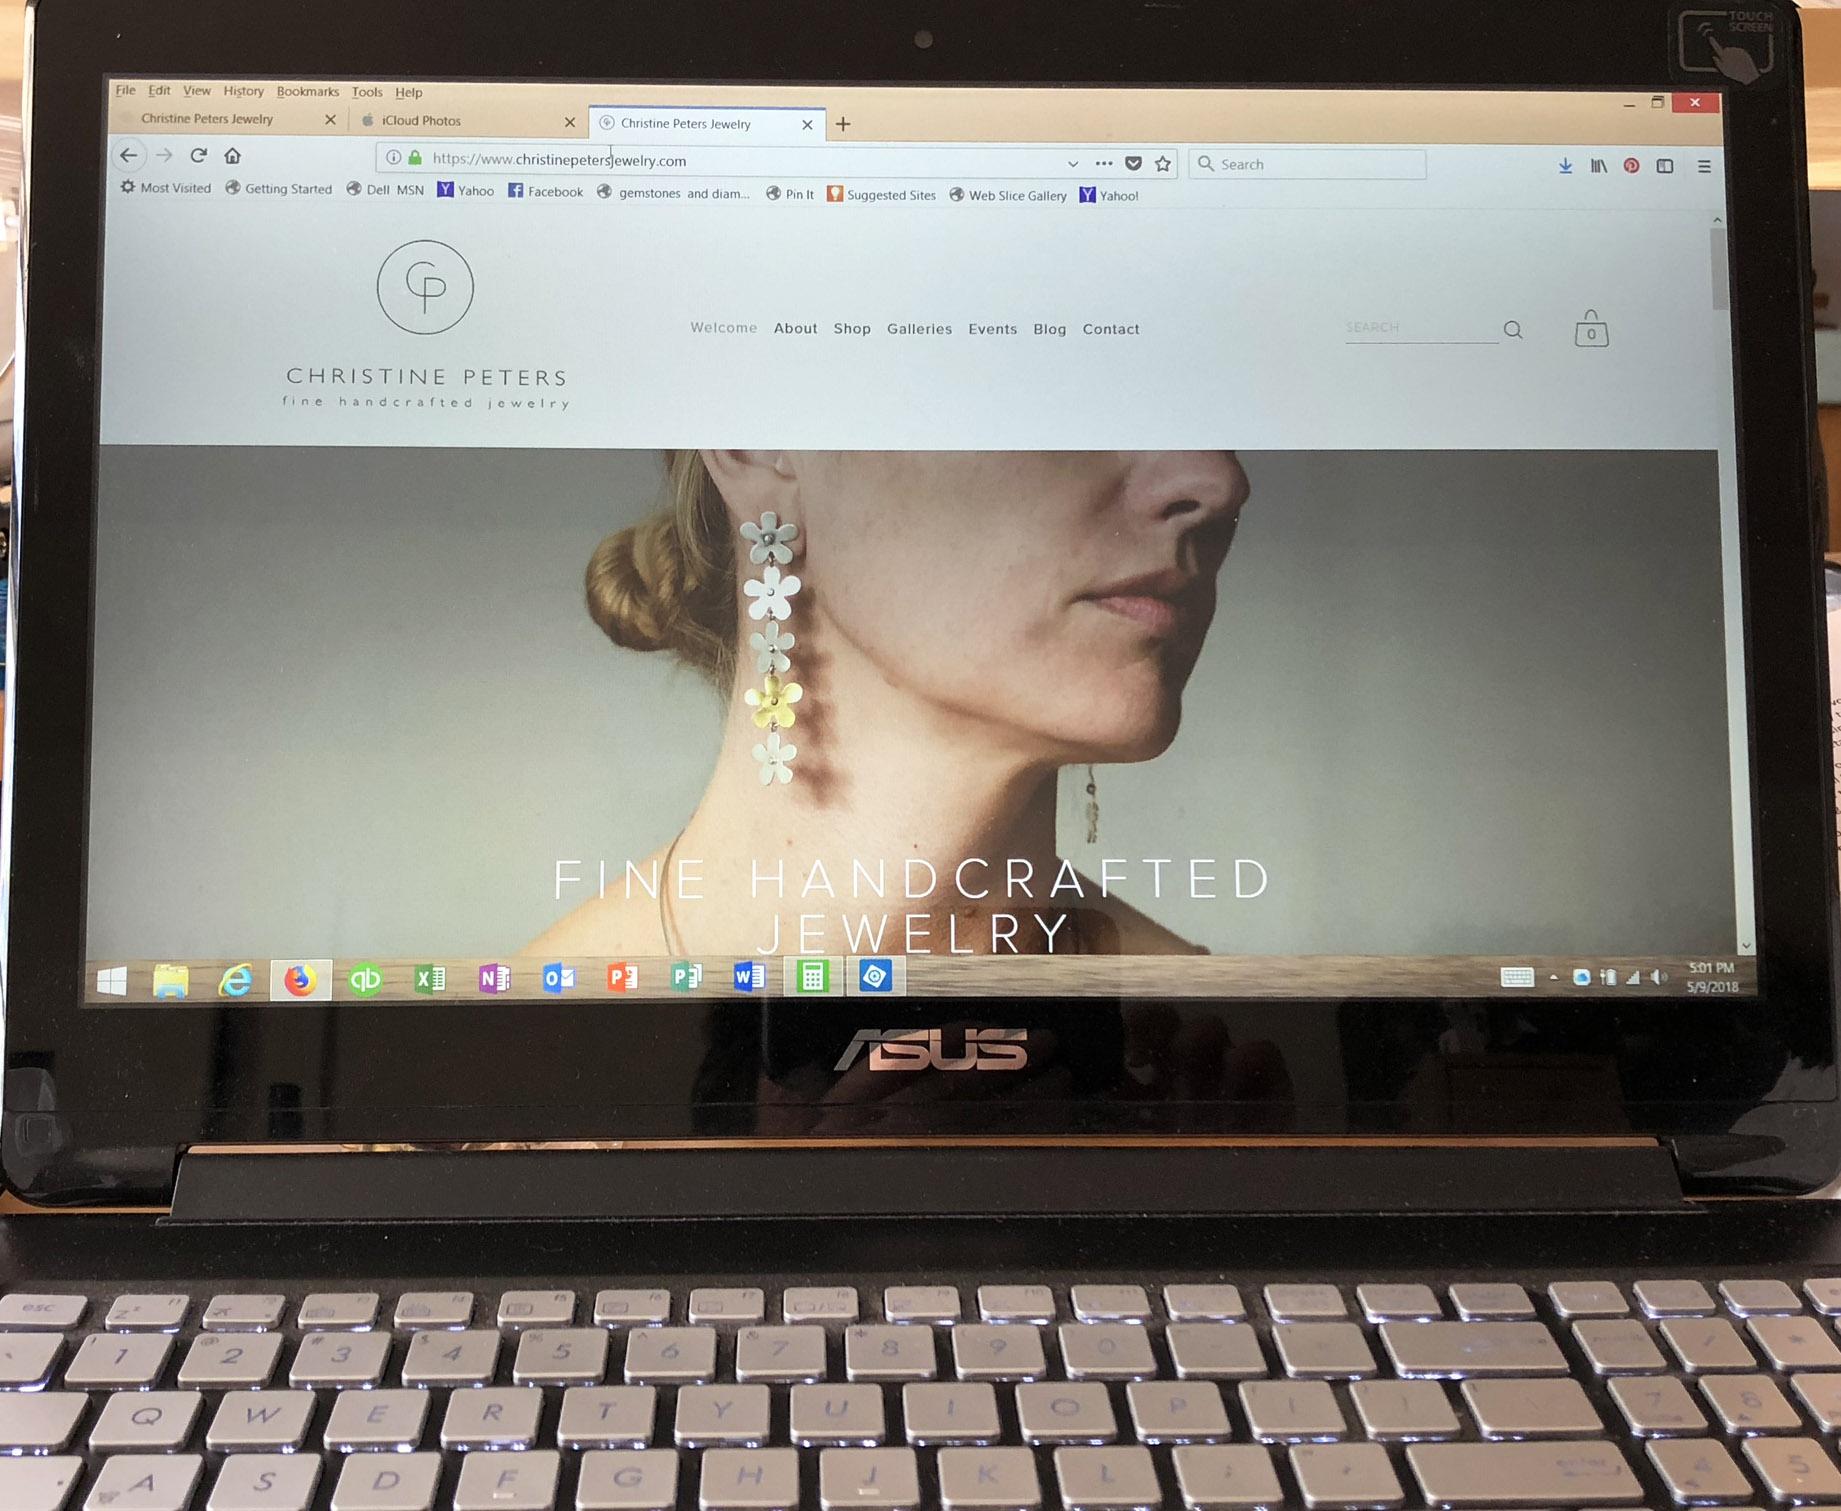 christine-peters-jewelry-website